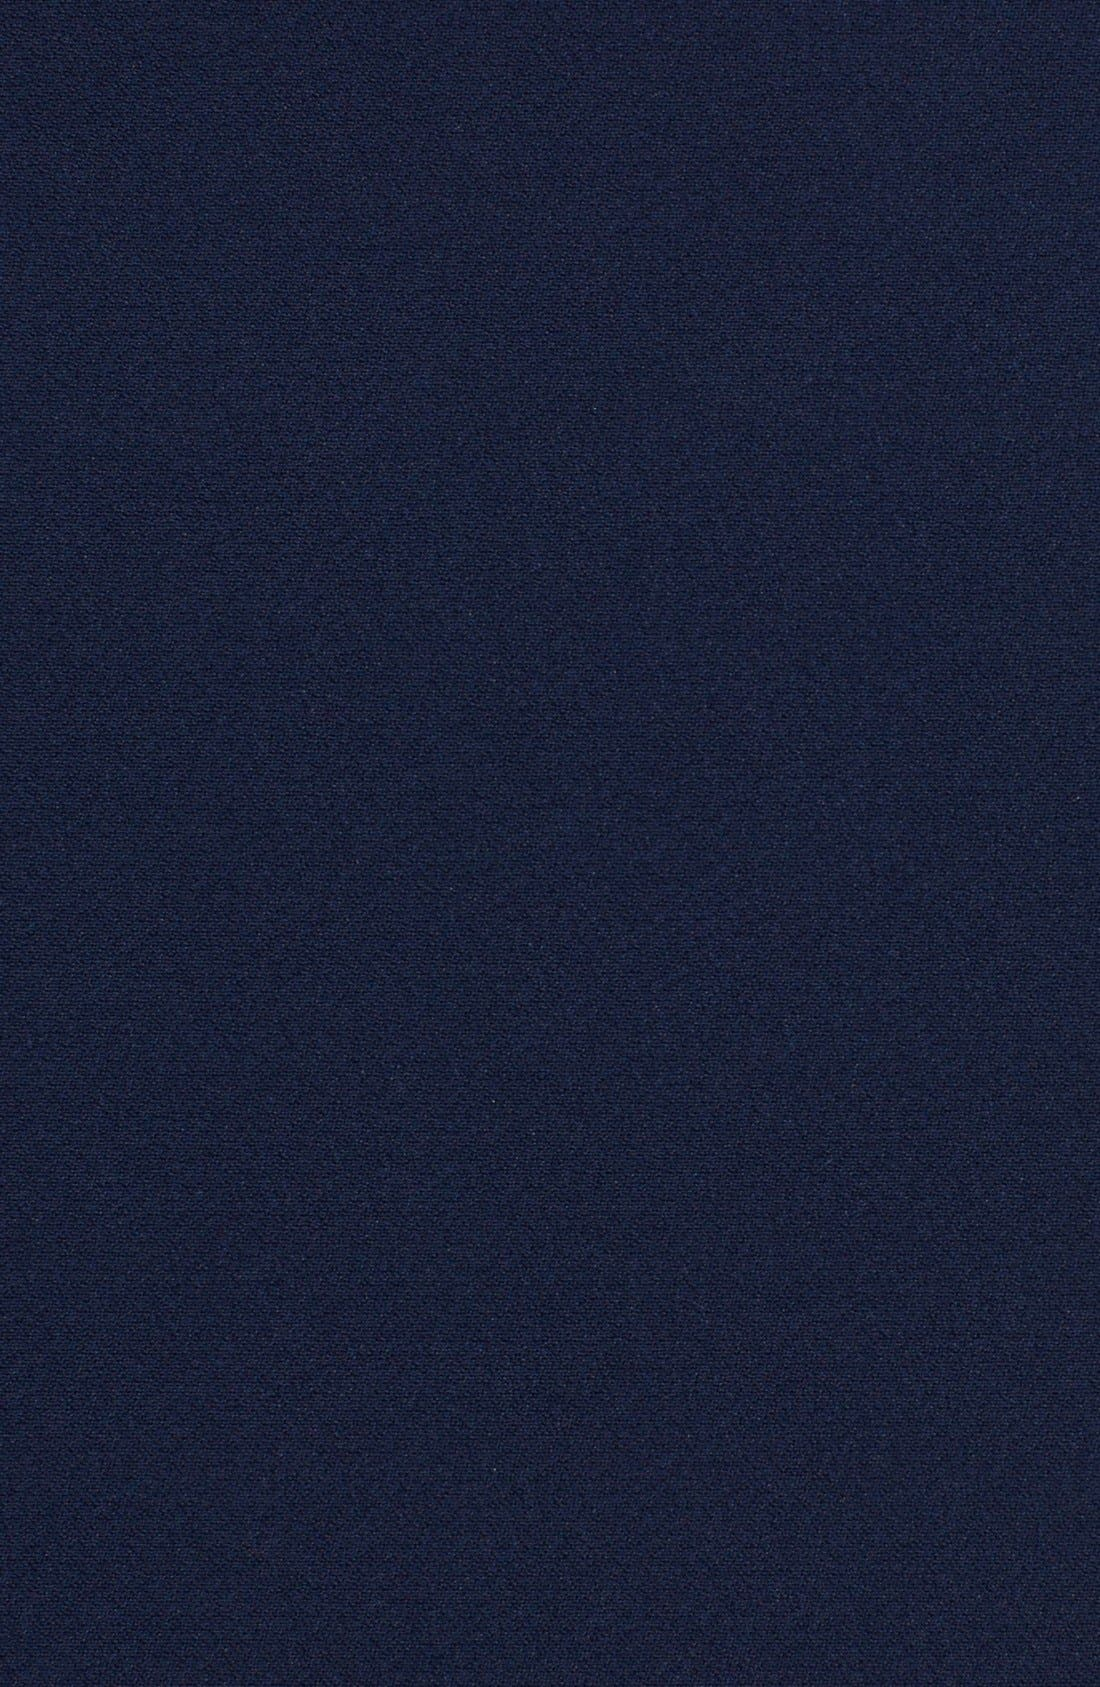 Alternate Image 3  - Alexander McQueen Crepe Dress